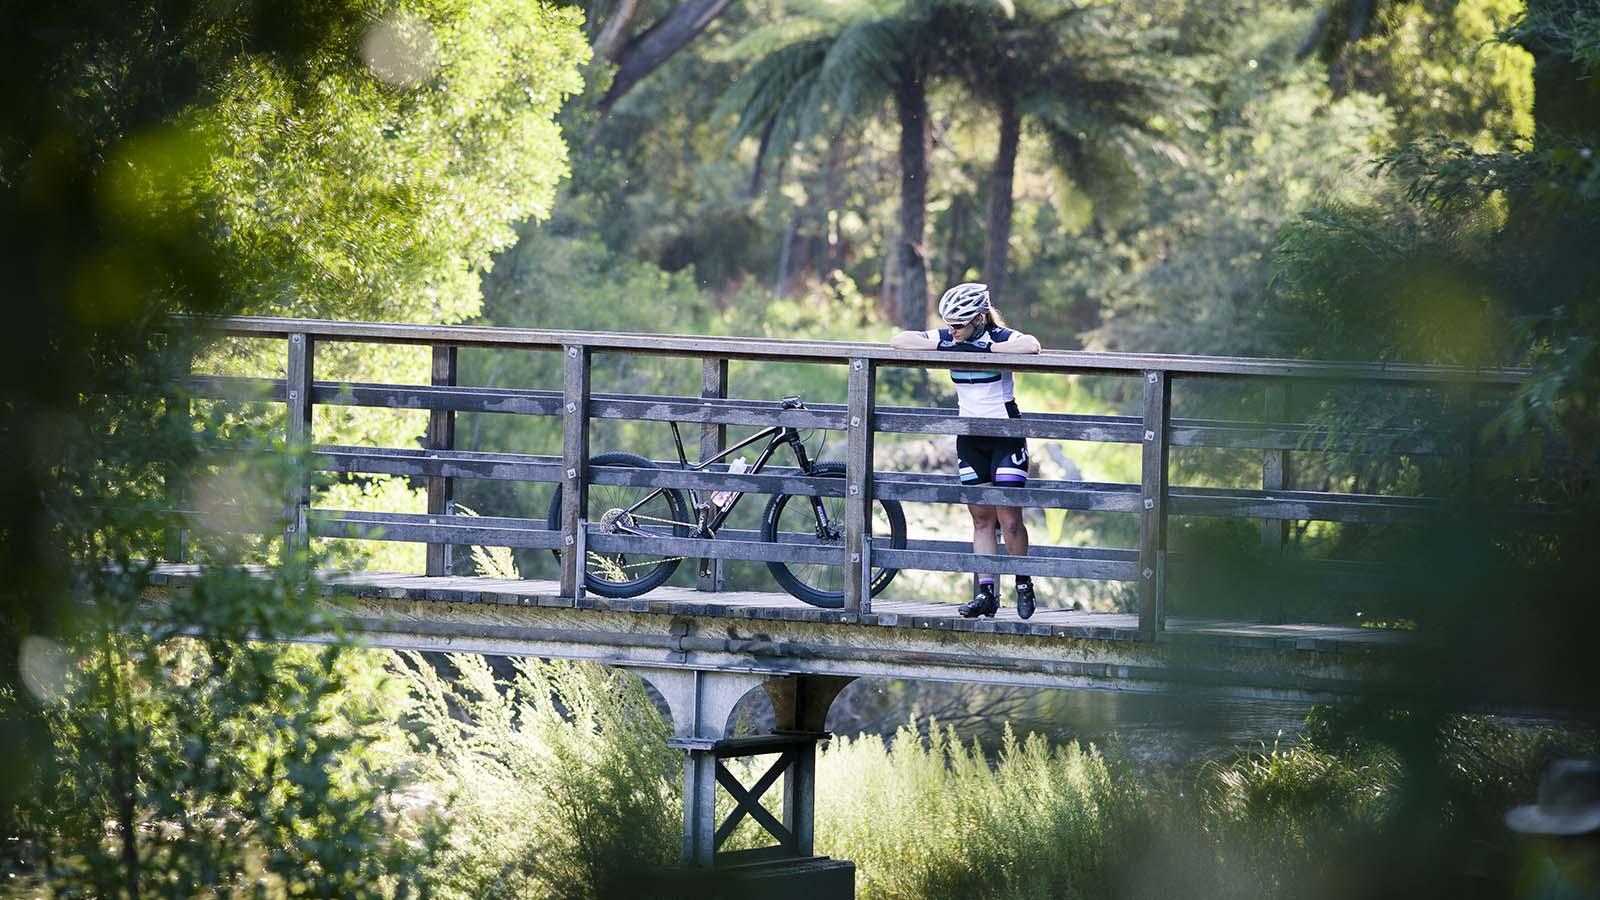 Warburton Rail Trail, Yarra Valley & Dandenong Ranges, Victoria, Australia